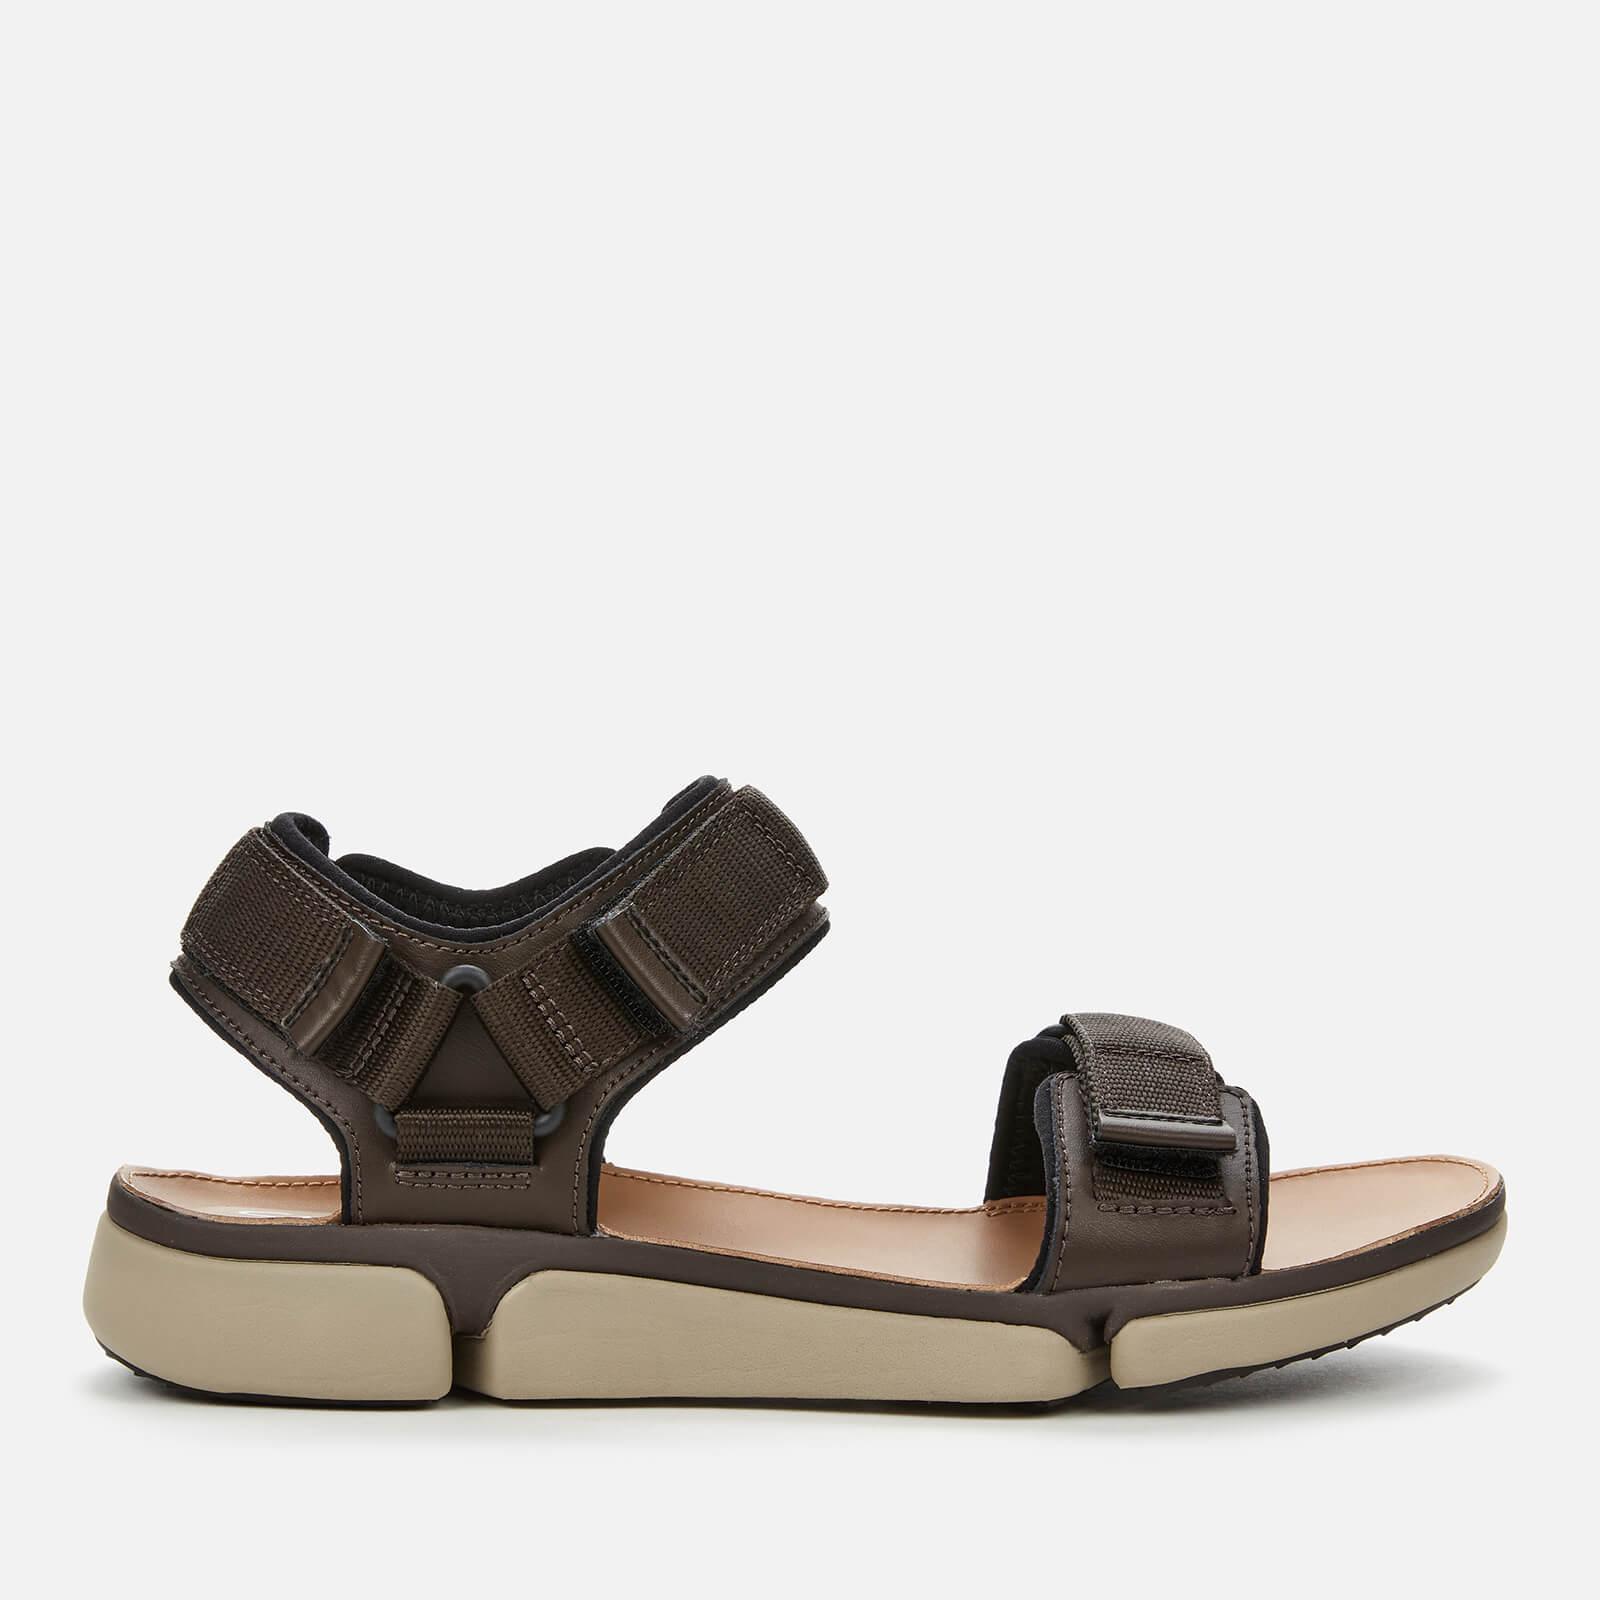 Clarks Men's Tri Cove Trail Outdoor Sandals - Dark Brown Combi - UK 8